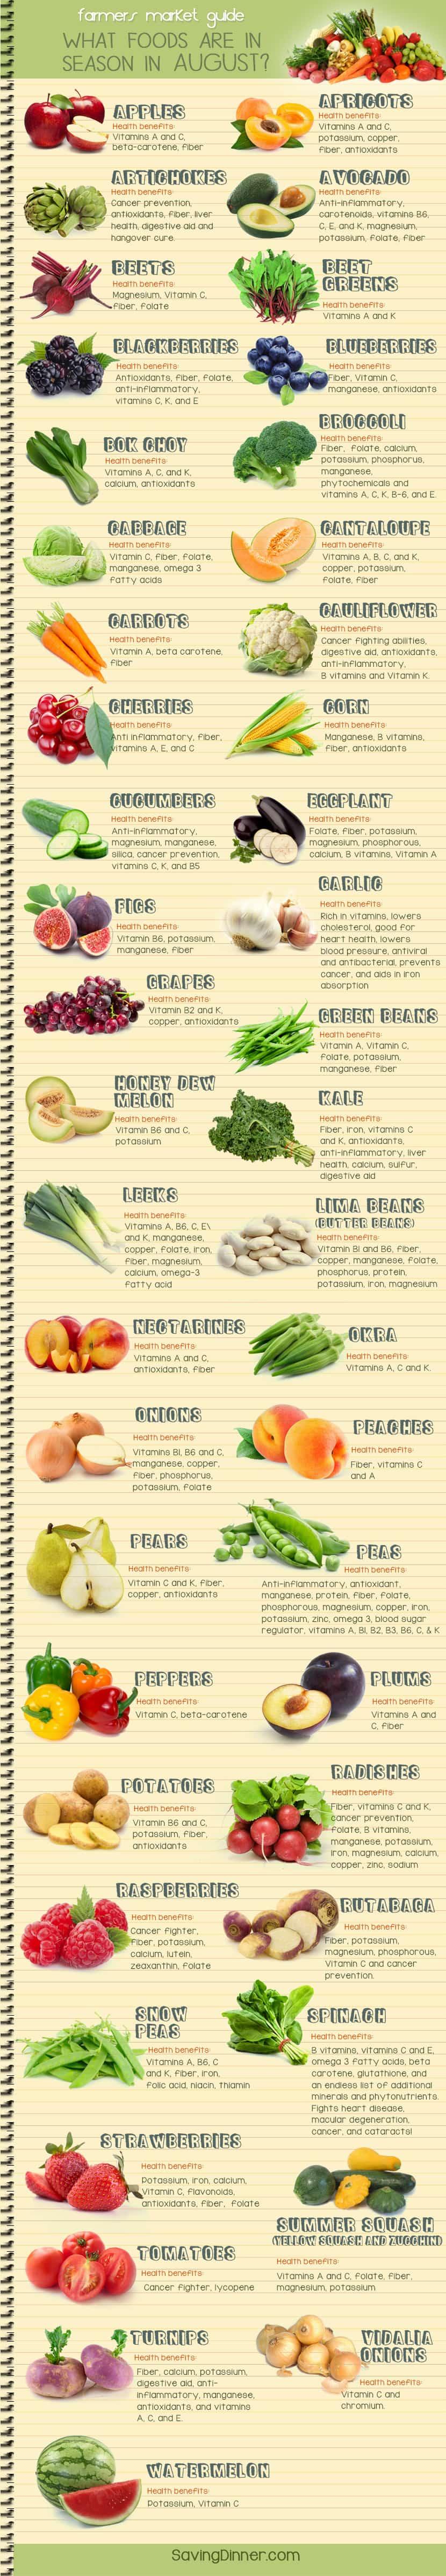 August Farmer's Market Guide Infographic